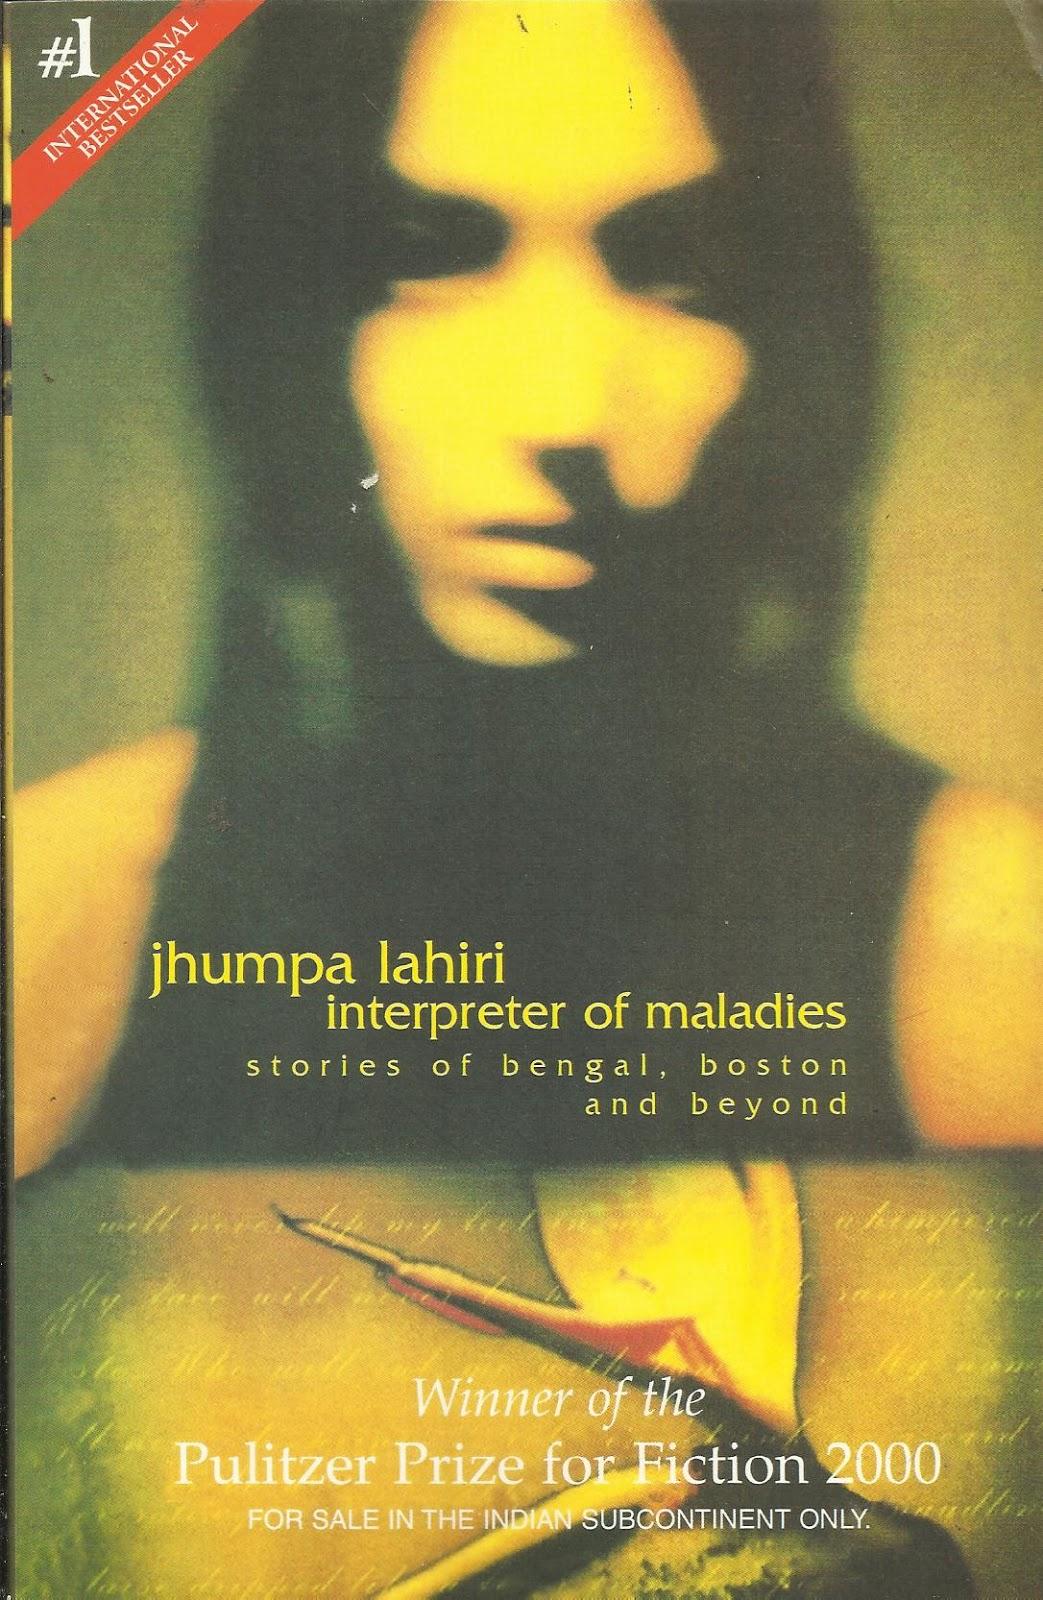 the treatment of bibi haldar Lahiri's story, the treatment of bibi haldar, is currently narrative's story of the week the story comes from lahiri's already-classic debut book of stories, interpreter of maladies (which she.